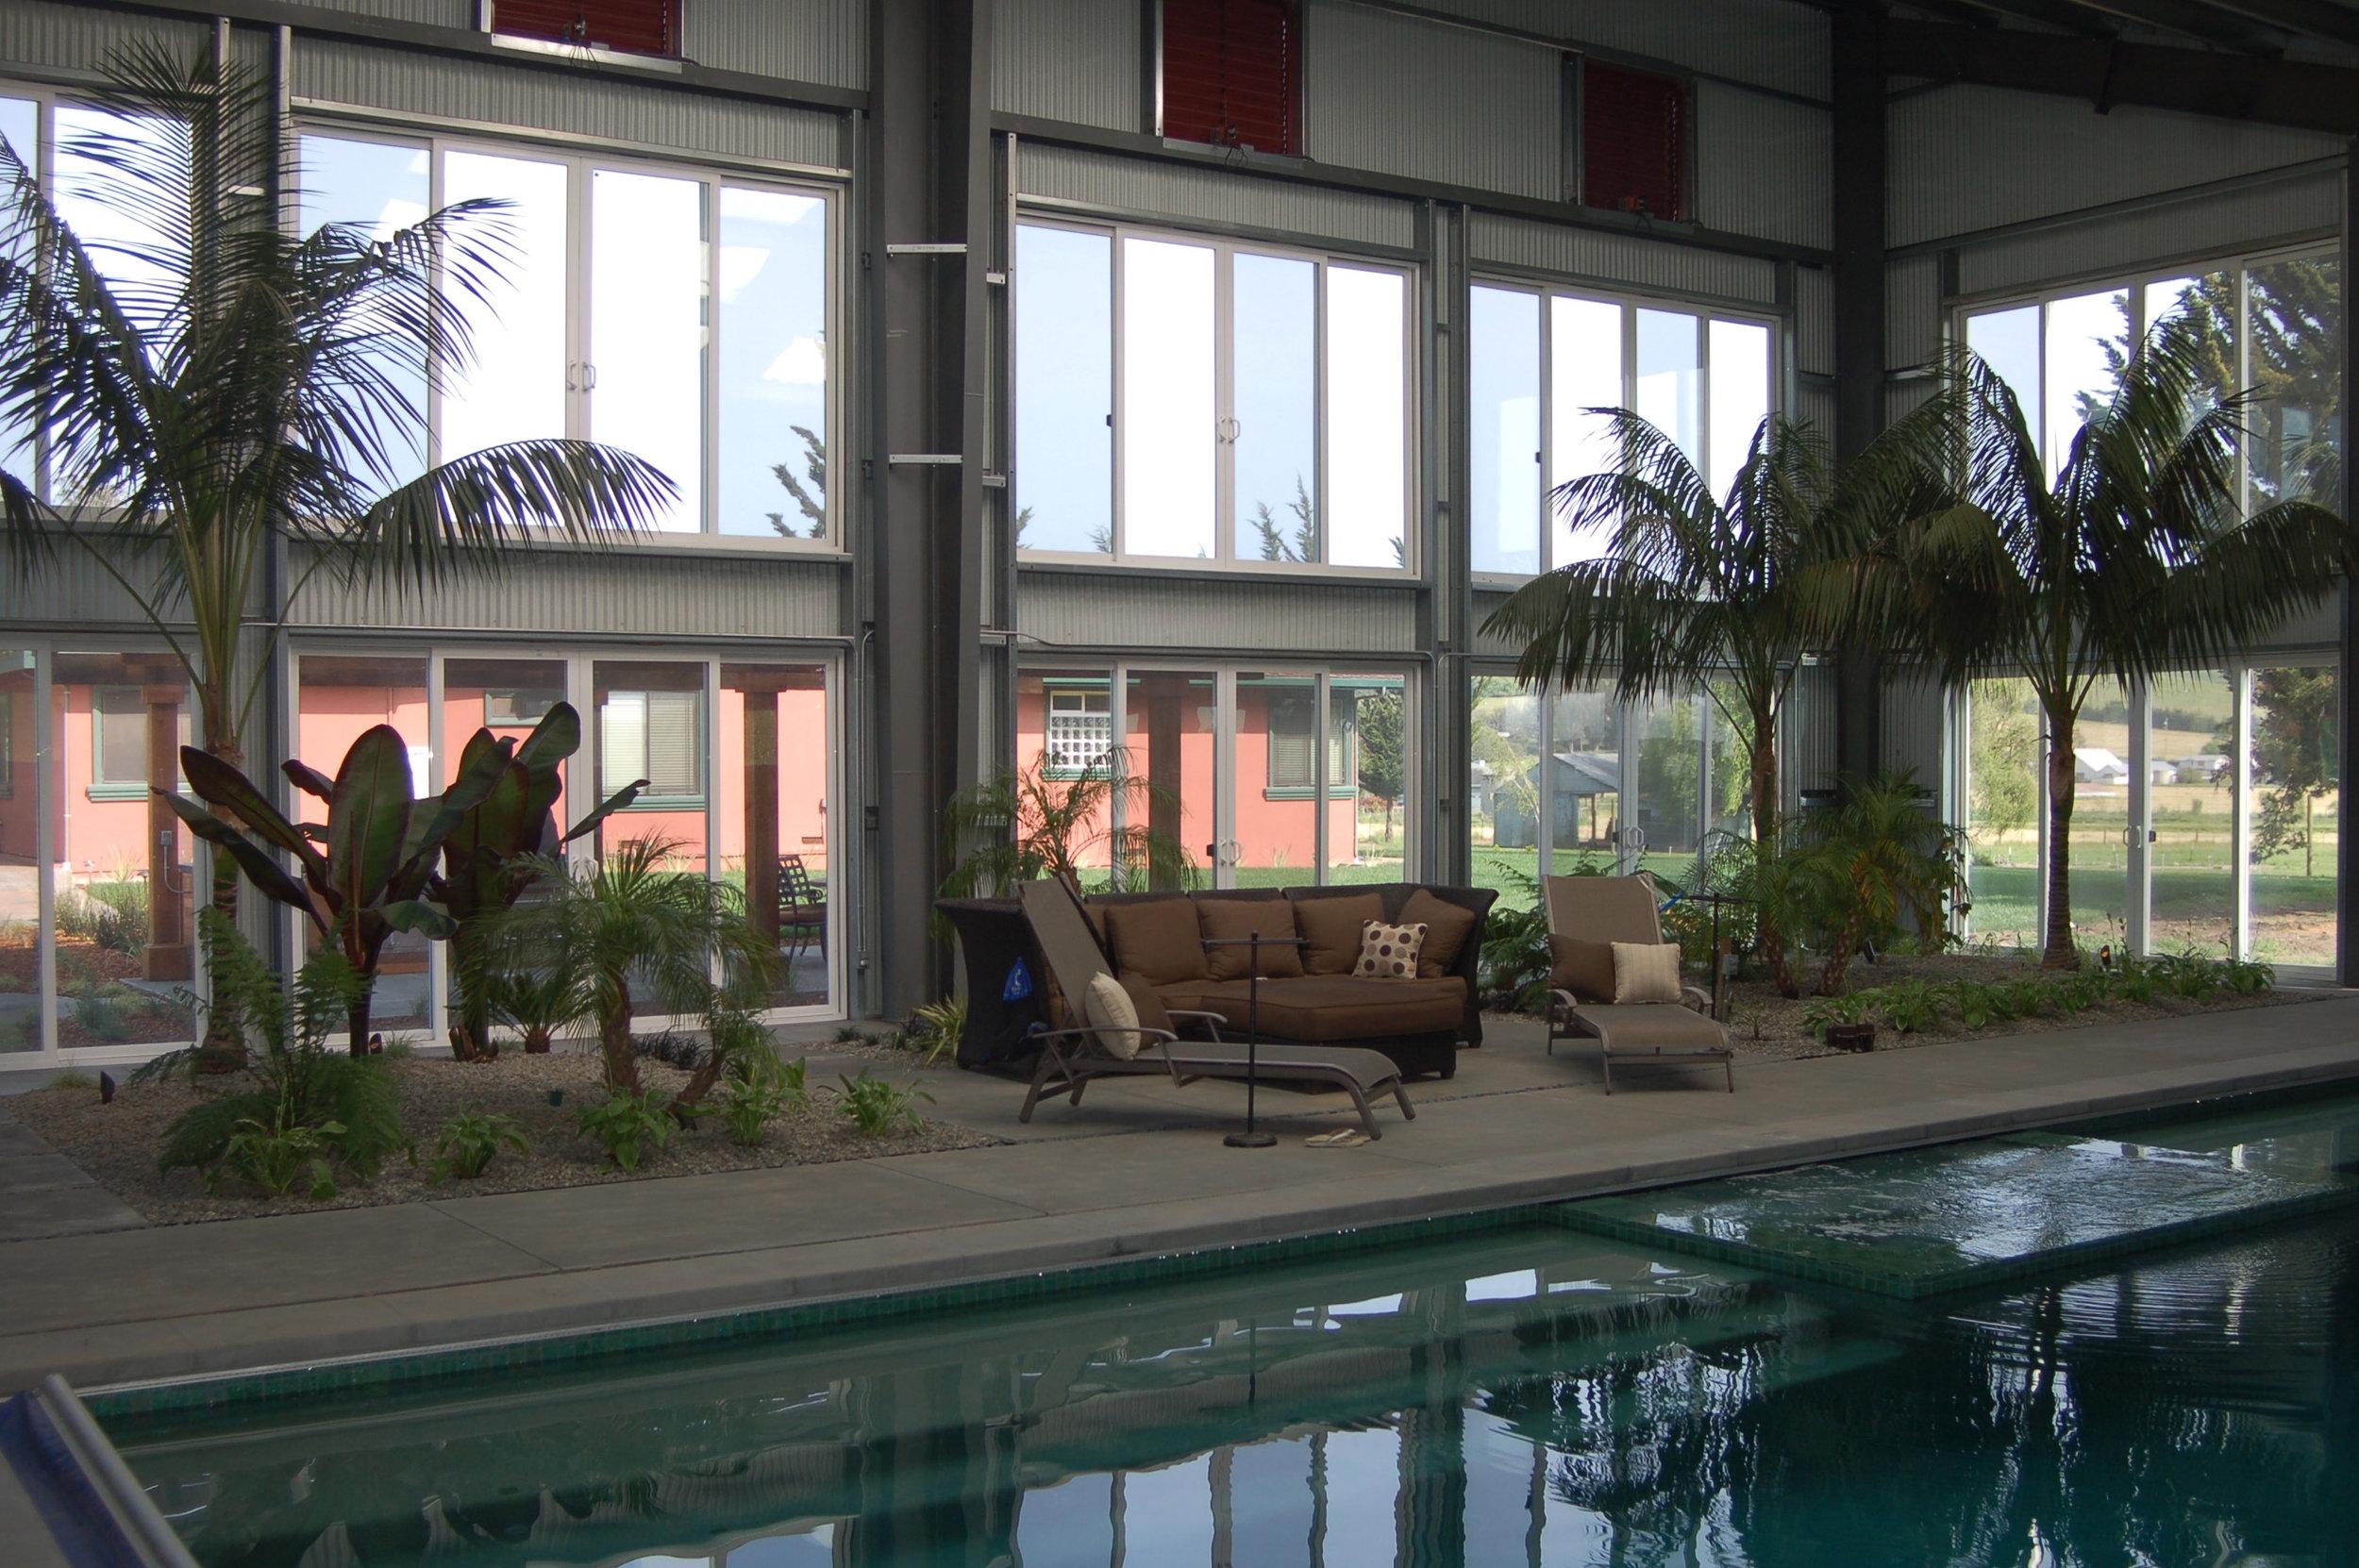 Copy of Petaluma Poolhouse